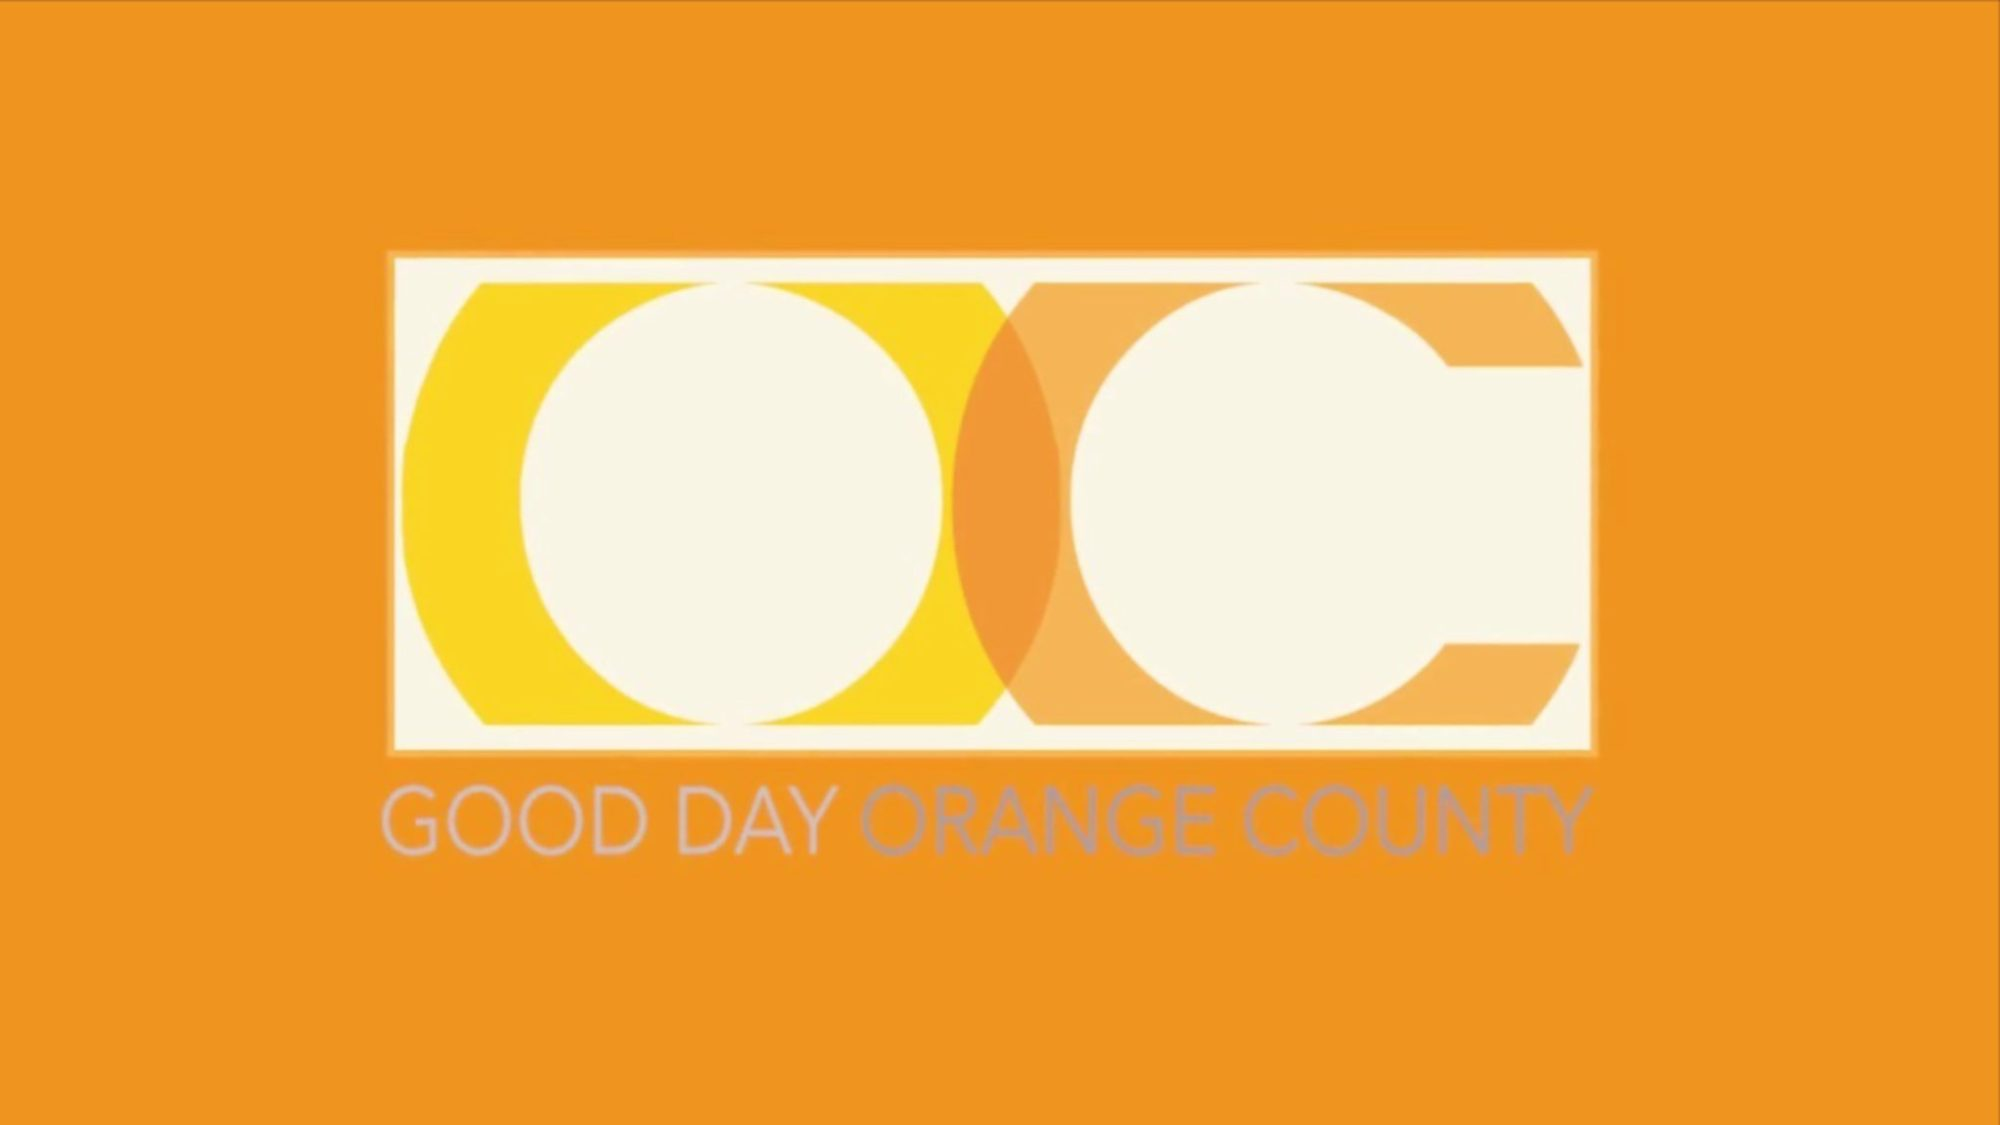 GOOD DAY OC